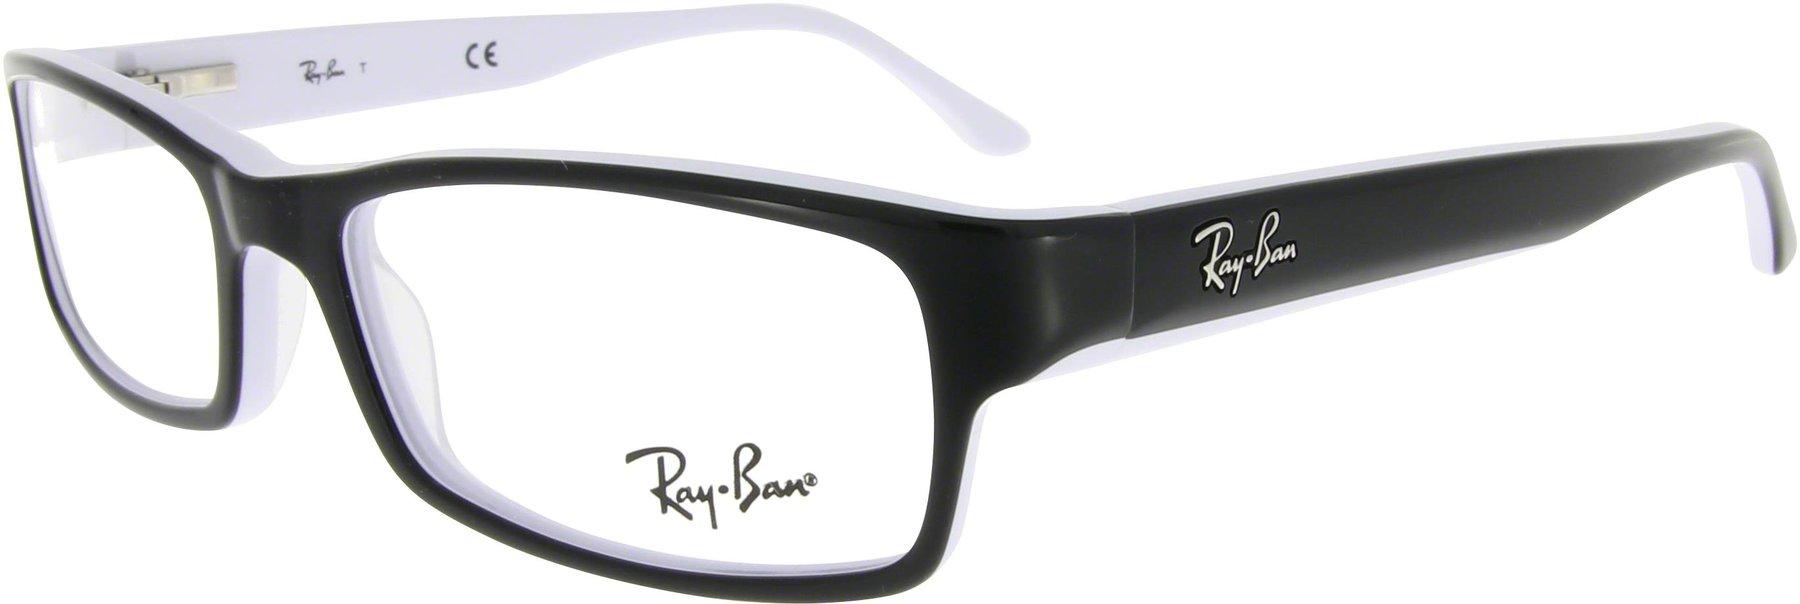 bb23d69237e9c5 Ray Ban RB5114 ab 69,49 € günstig im Preisvergleich kaufen